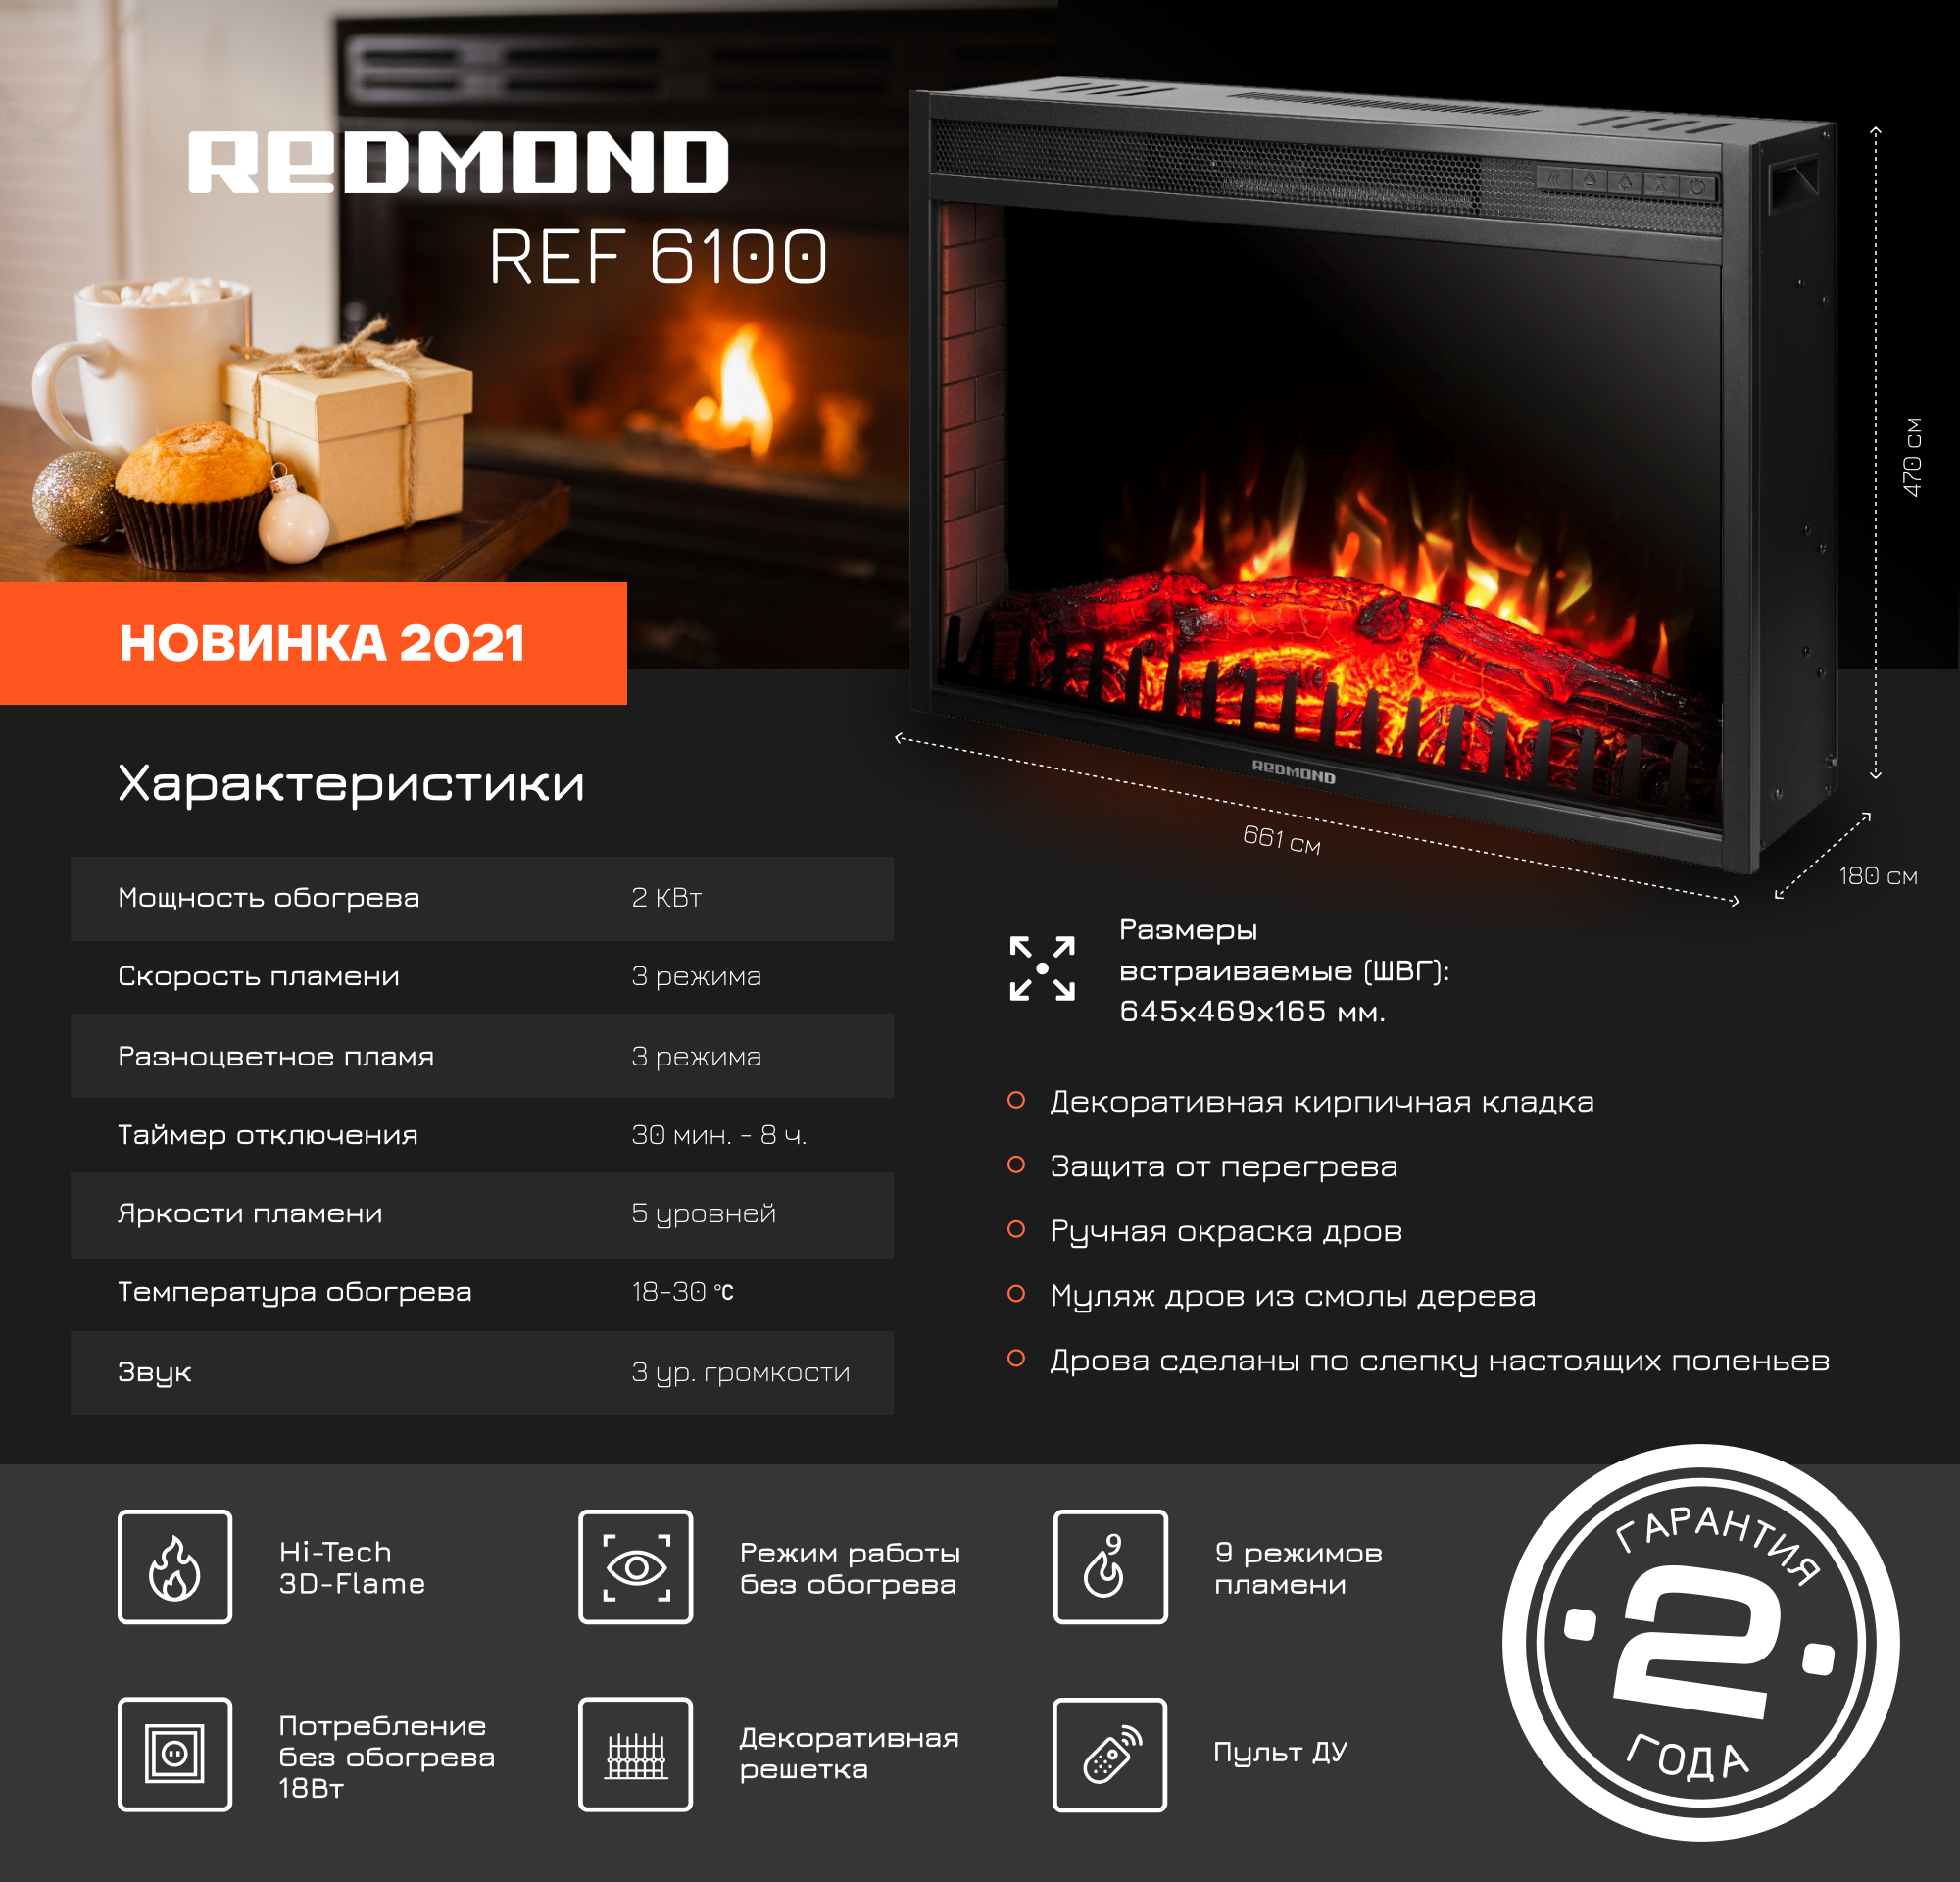 https://bio-kamin24.ru/images/upload/Redmond%20REF-6100%20ban.png